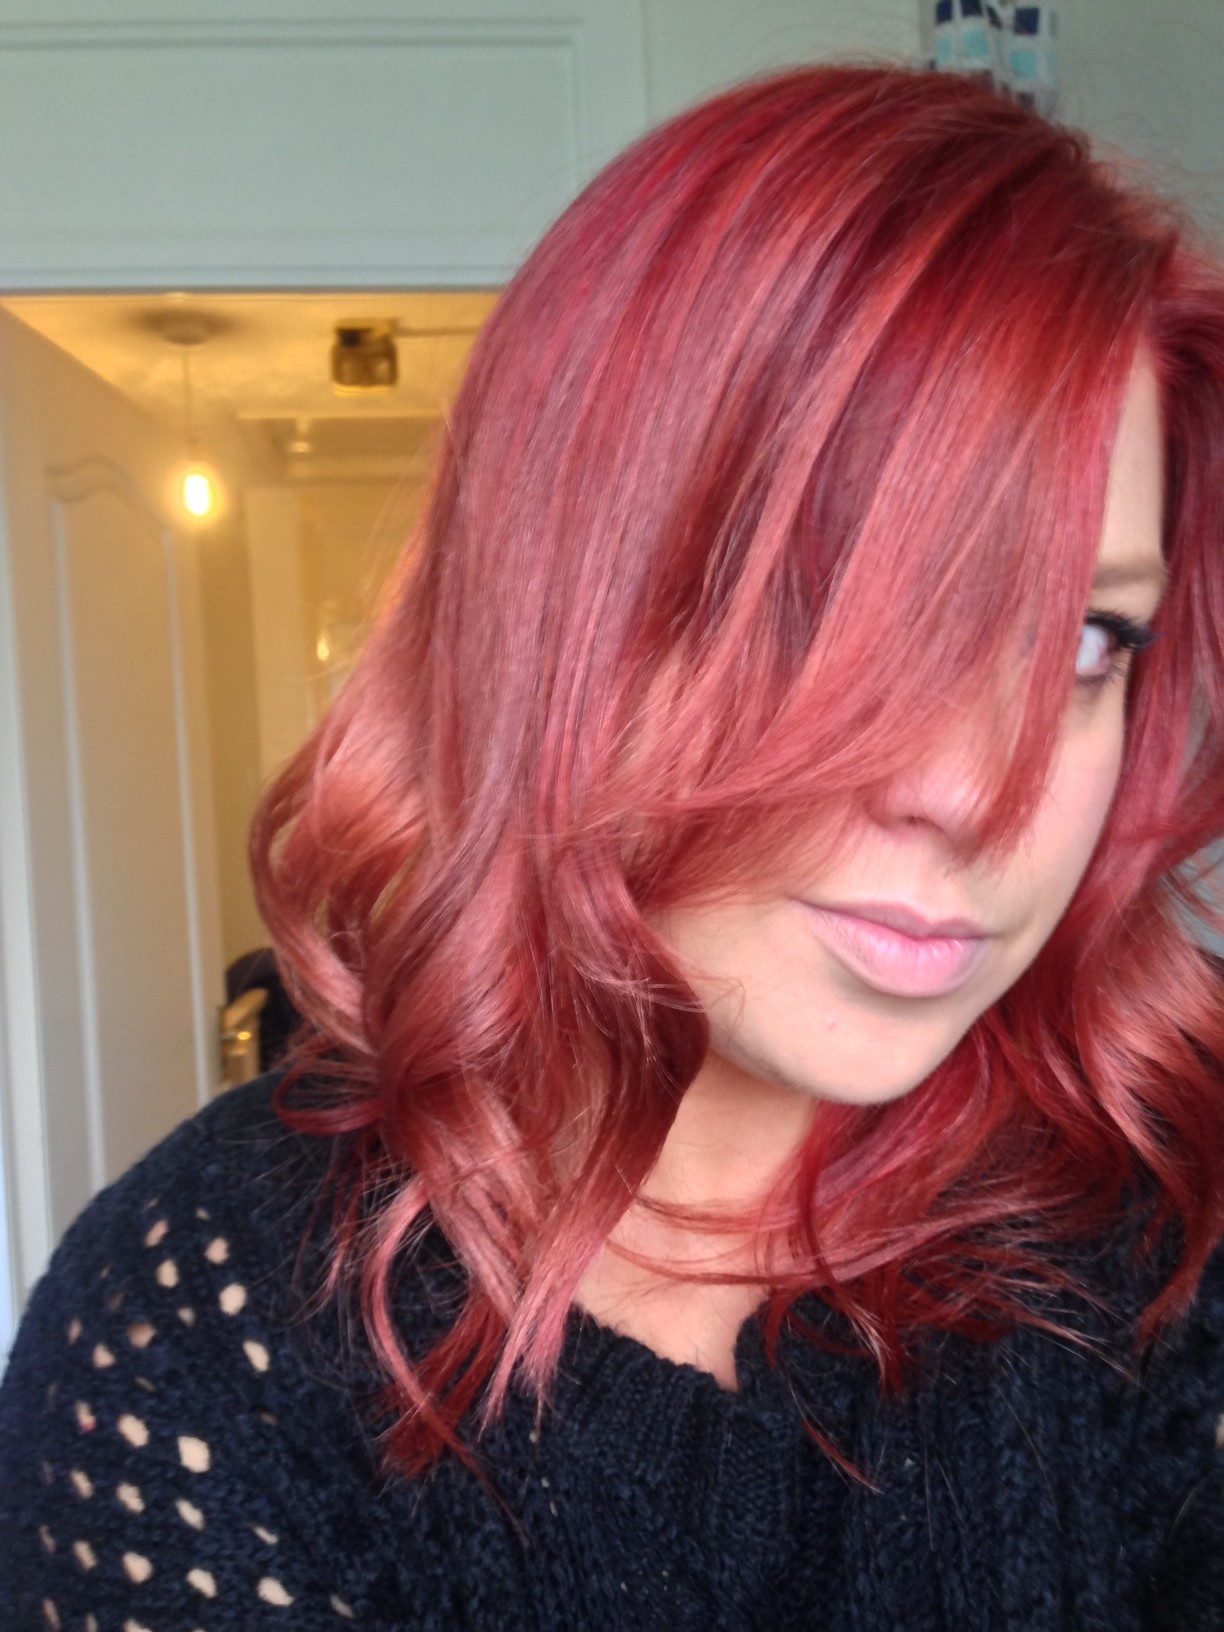 Garnier Nutrisse Ultra Color Hair Colourant Fiery Red 660  Dark Brown Hairs